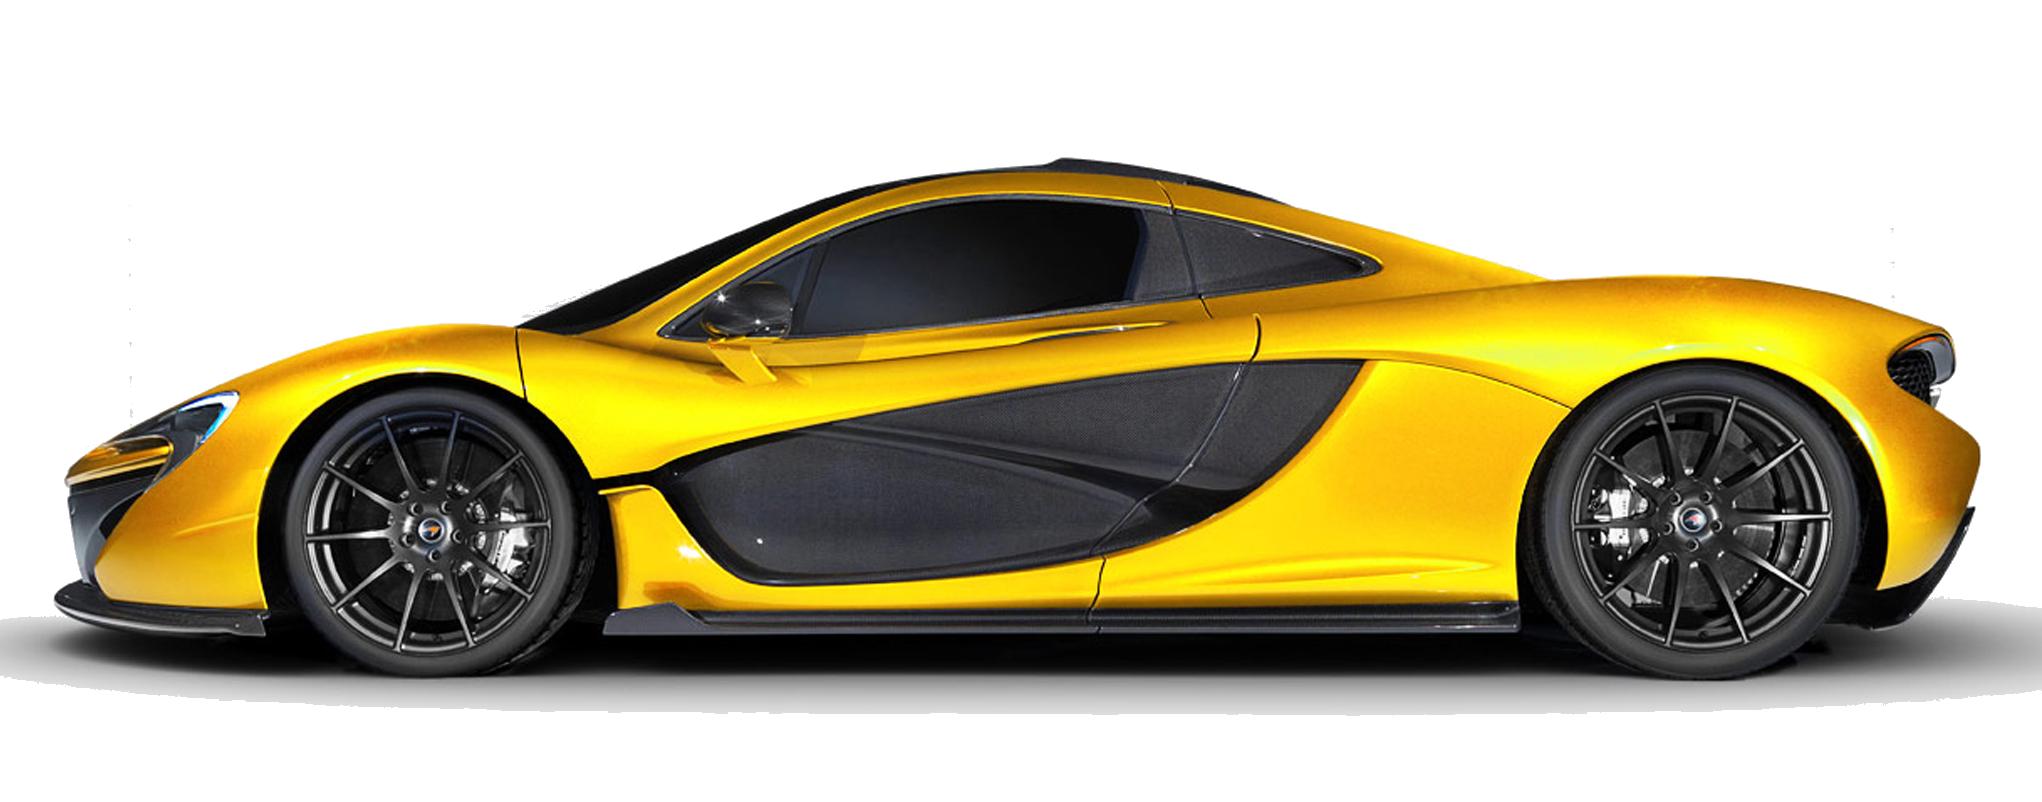 Real Racing 3 McLaren Automotive McLaren P1 - Mclaren P1 Png Clipart ... black and white download